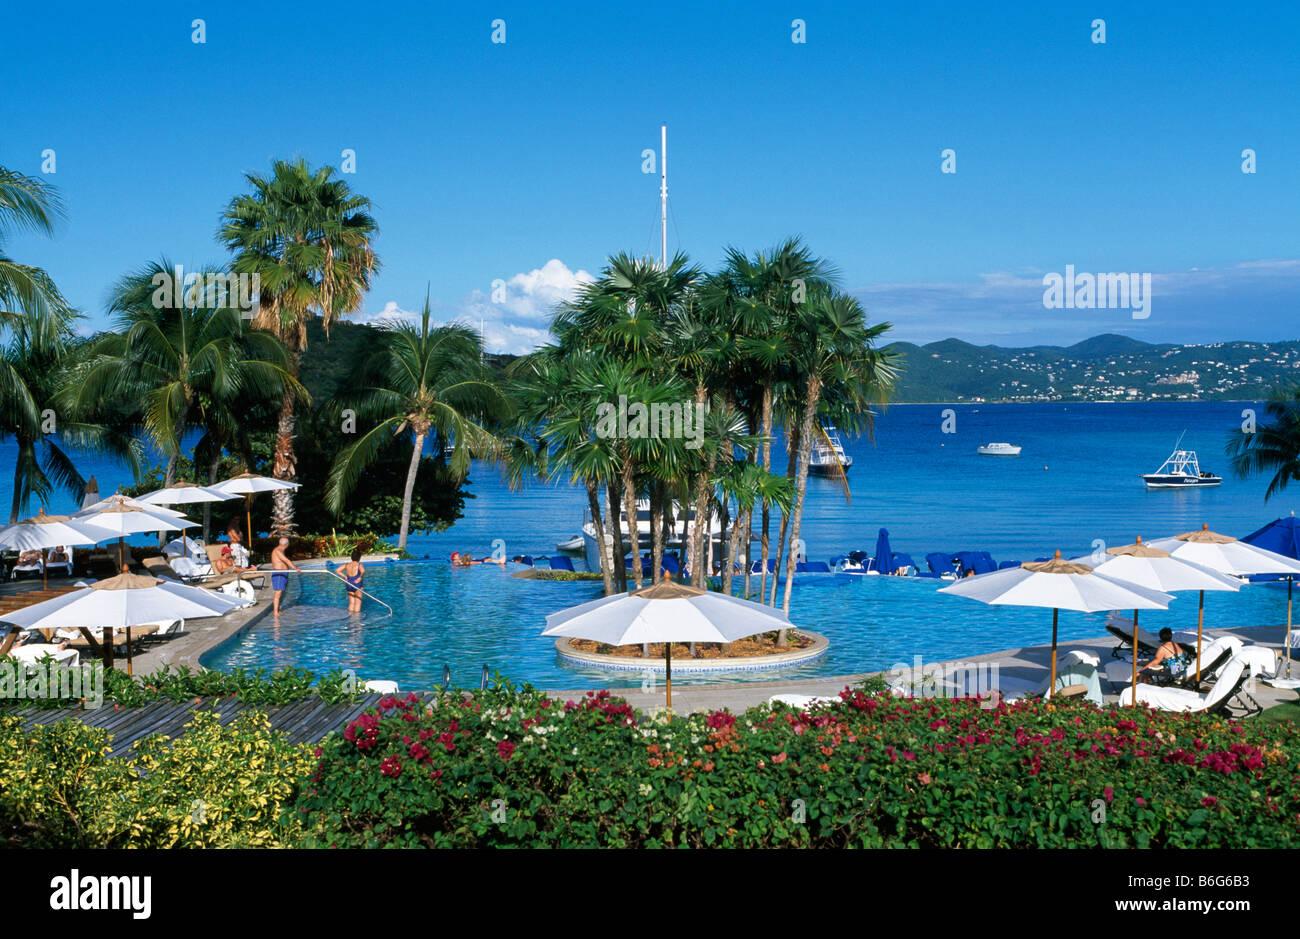 St Thomas Island Holidays